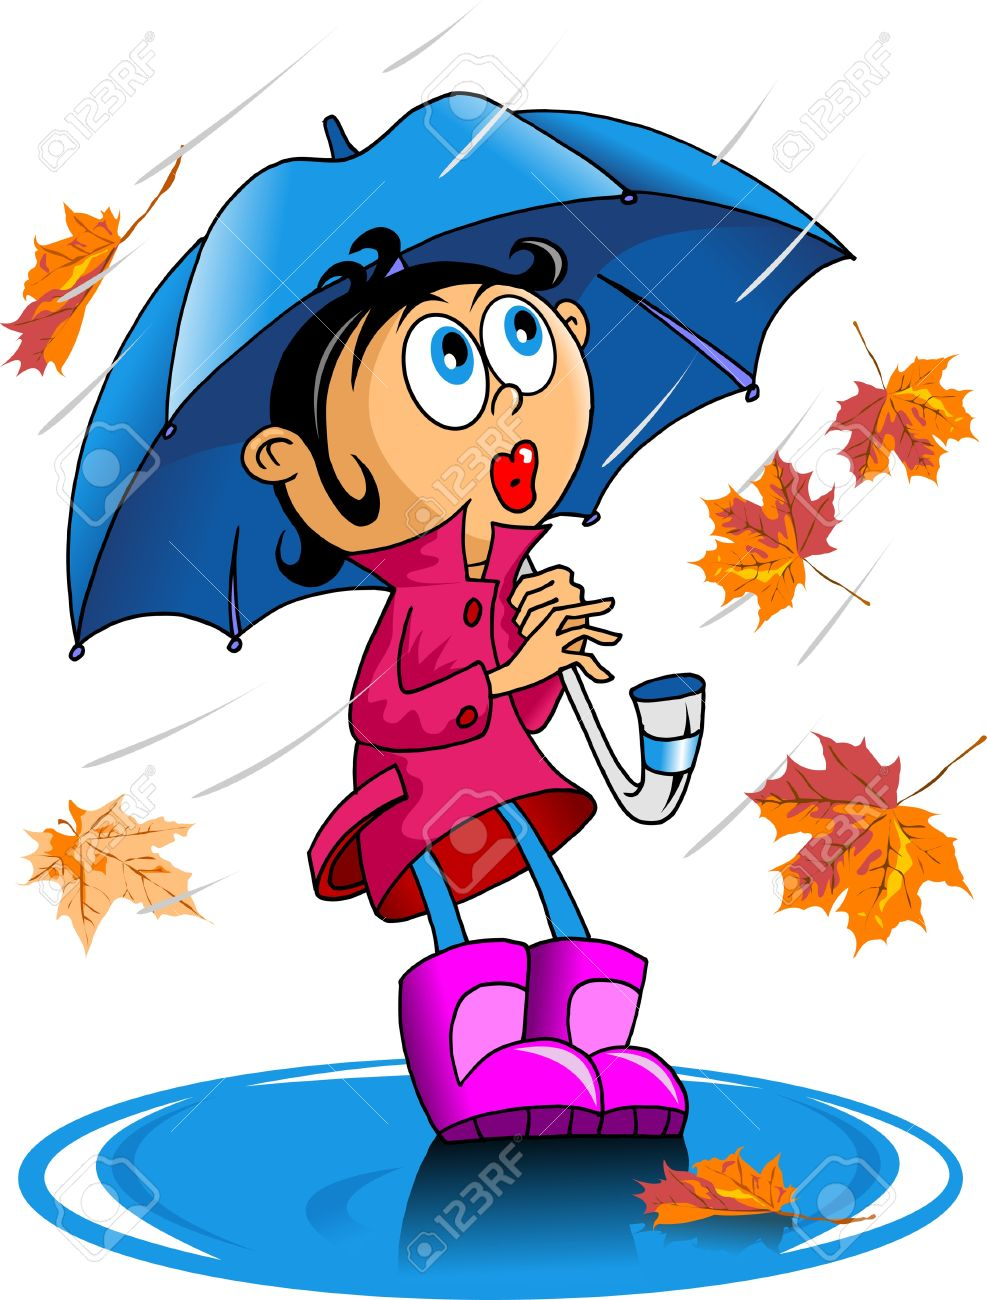 little girl walking with an umbrella in the rain Stock Vector - 14019557